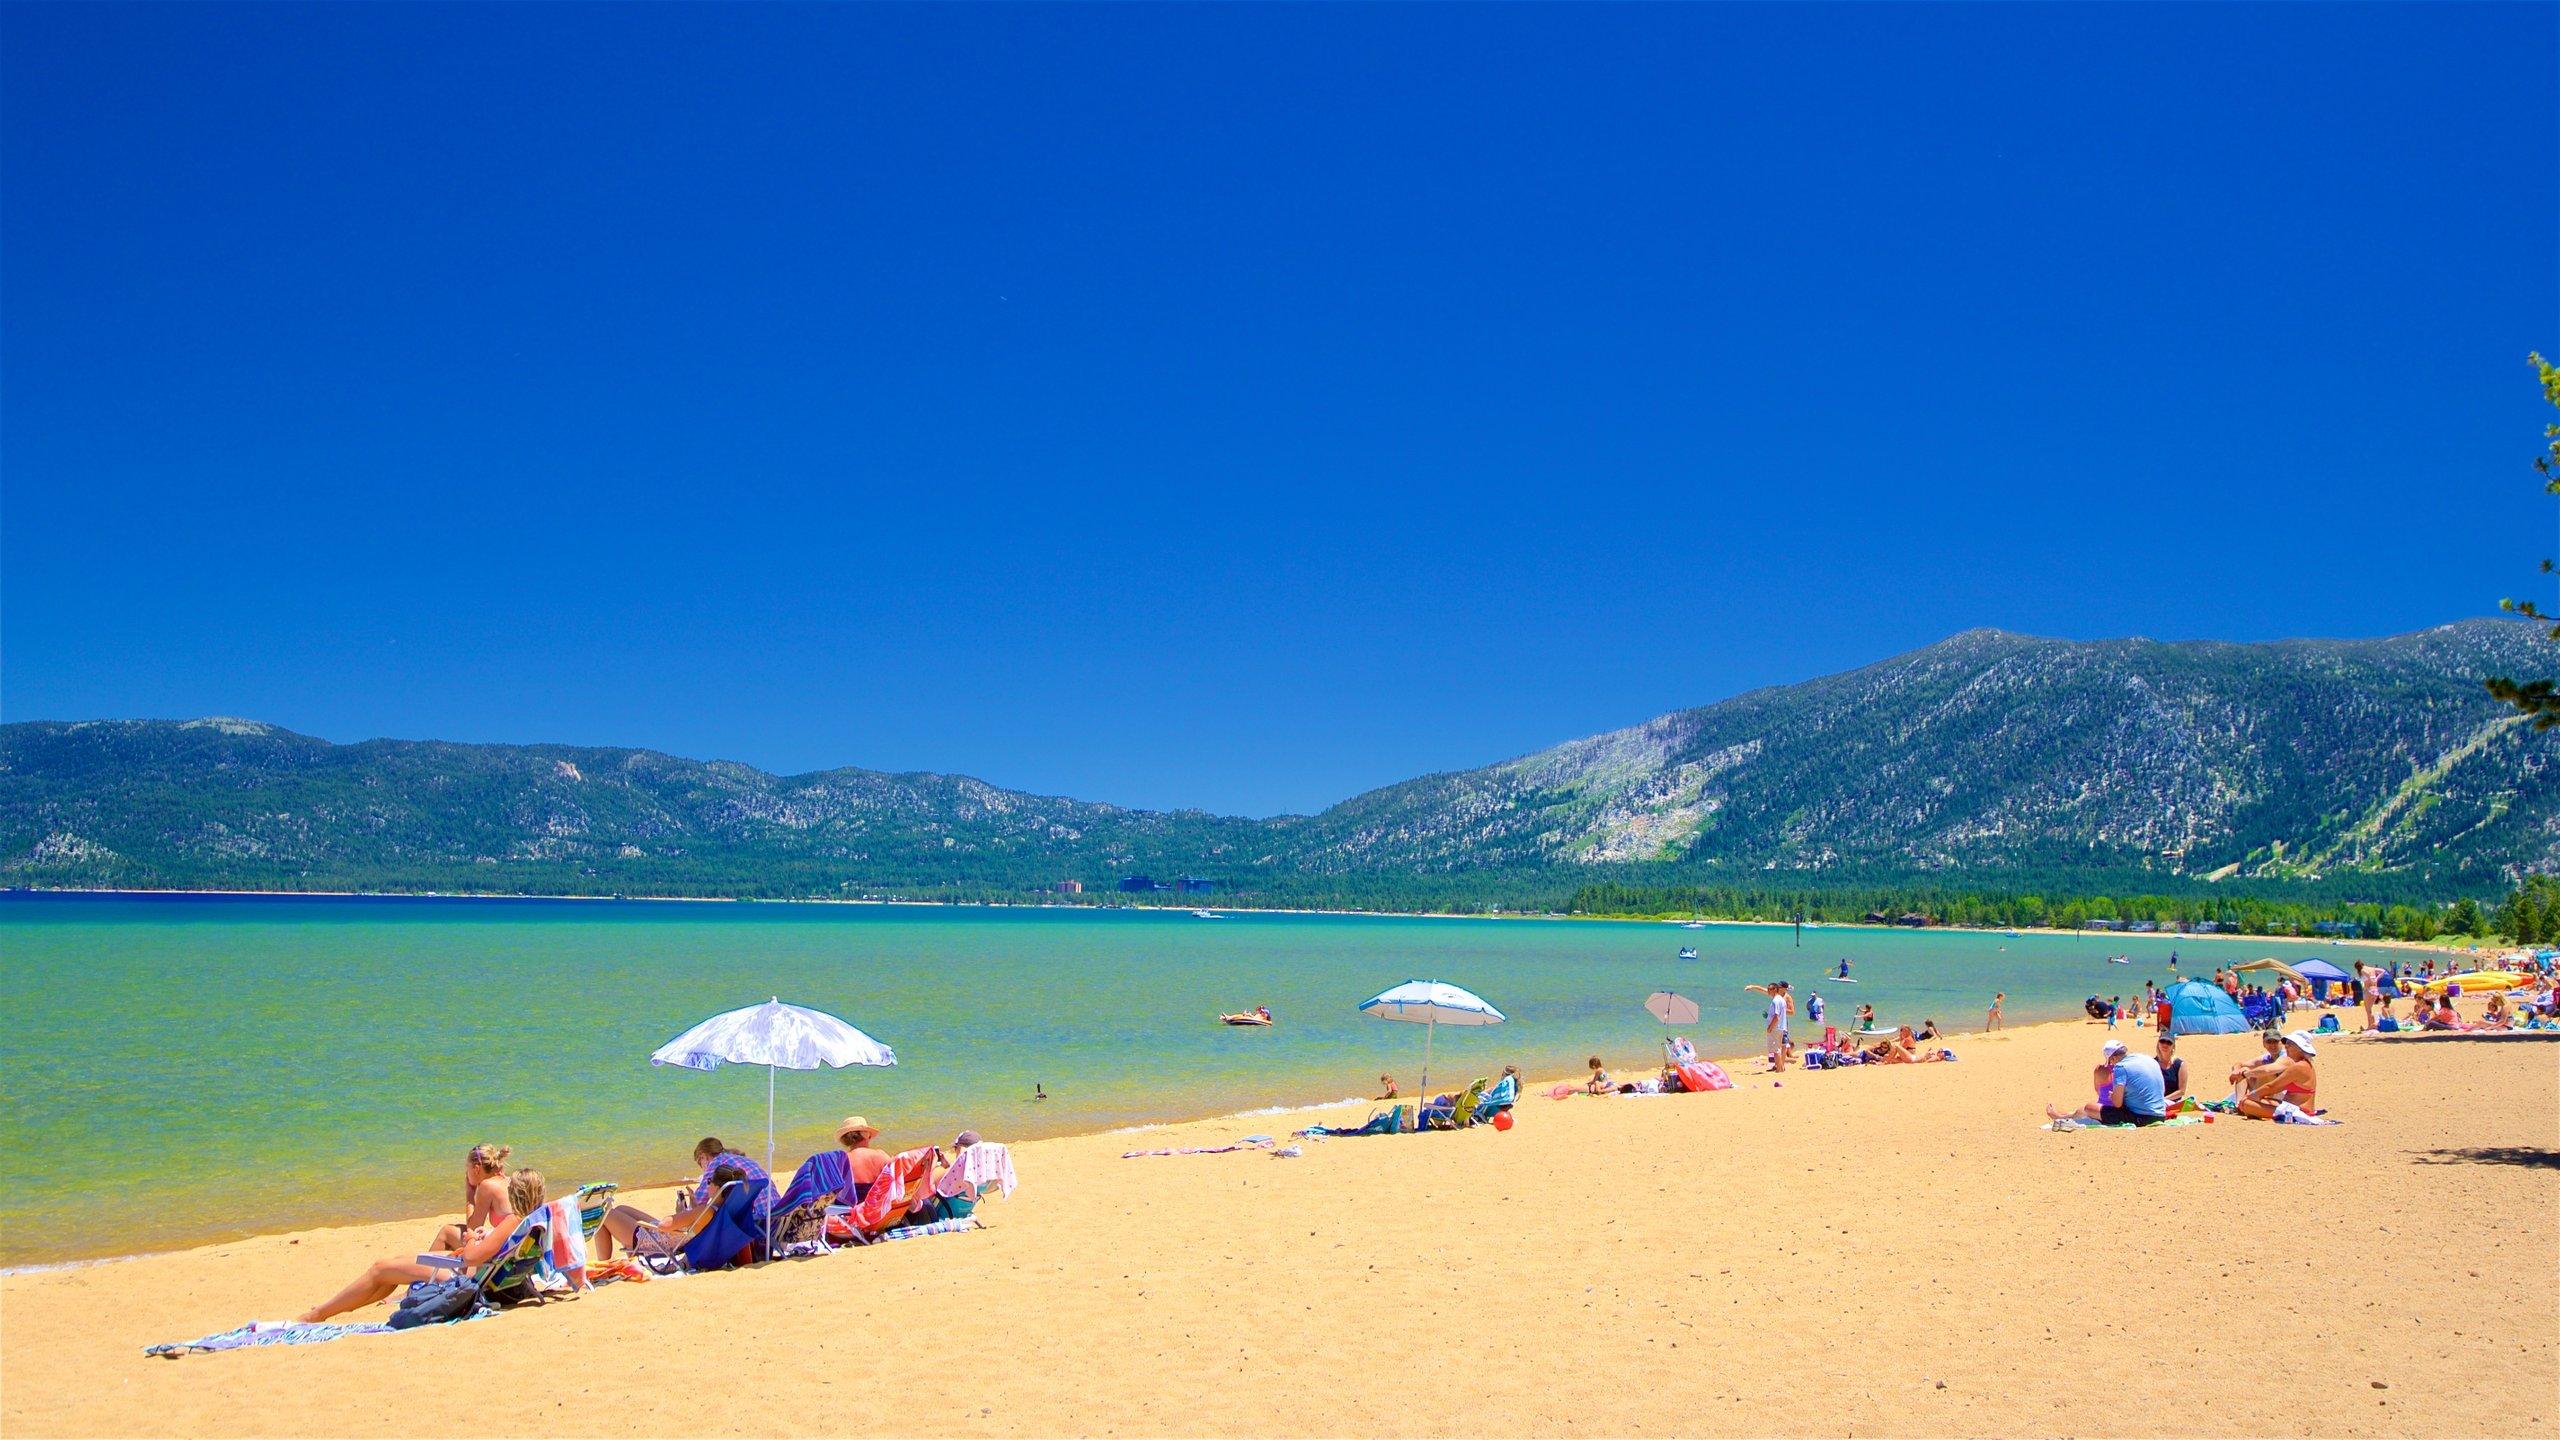 Pope Beach, South Lake Tahoe, California, United States of America